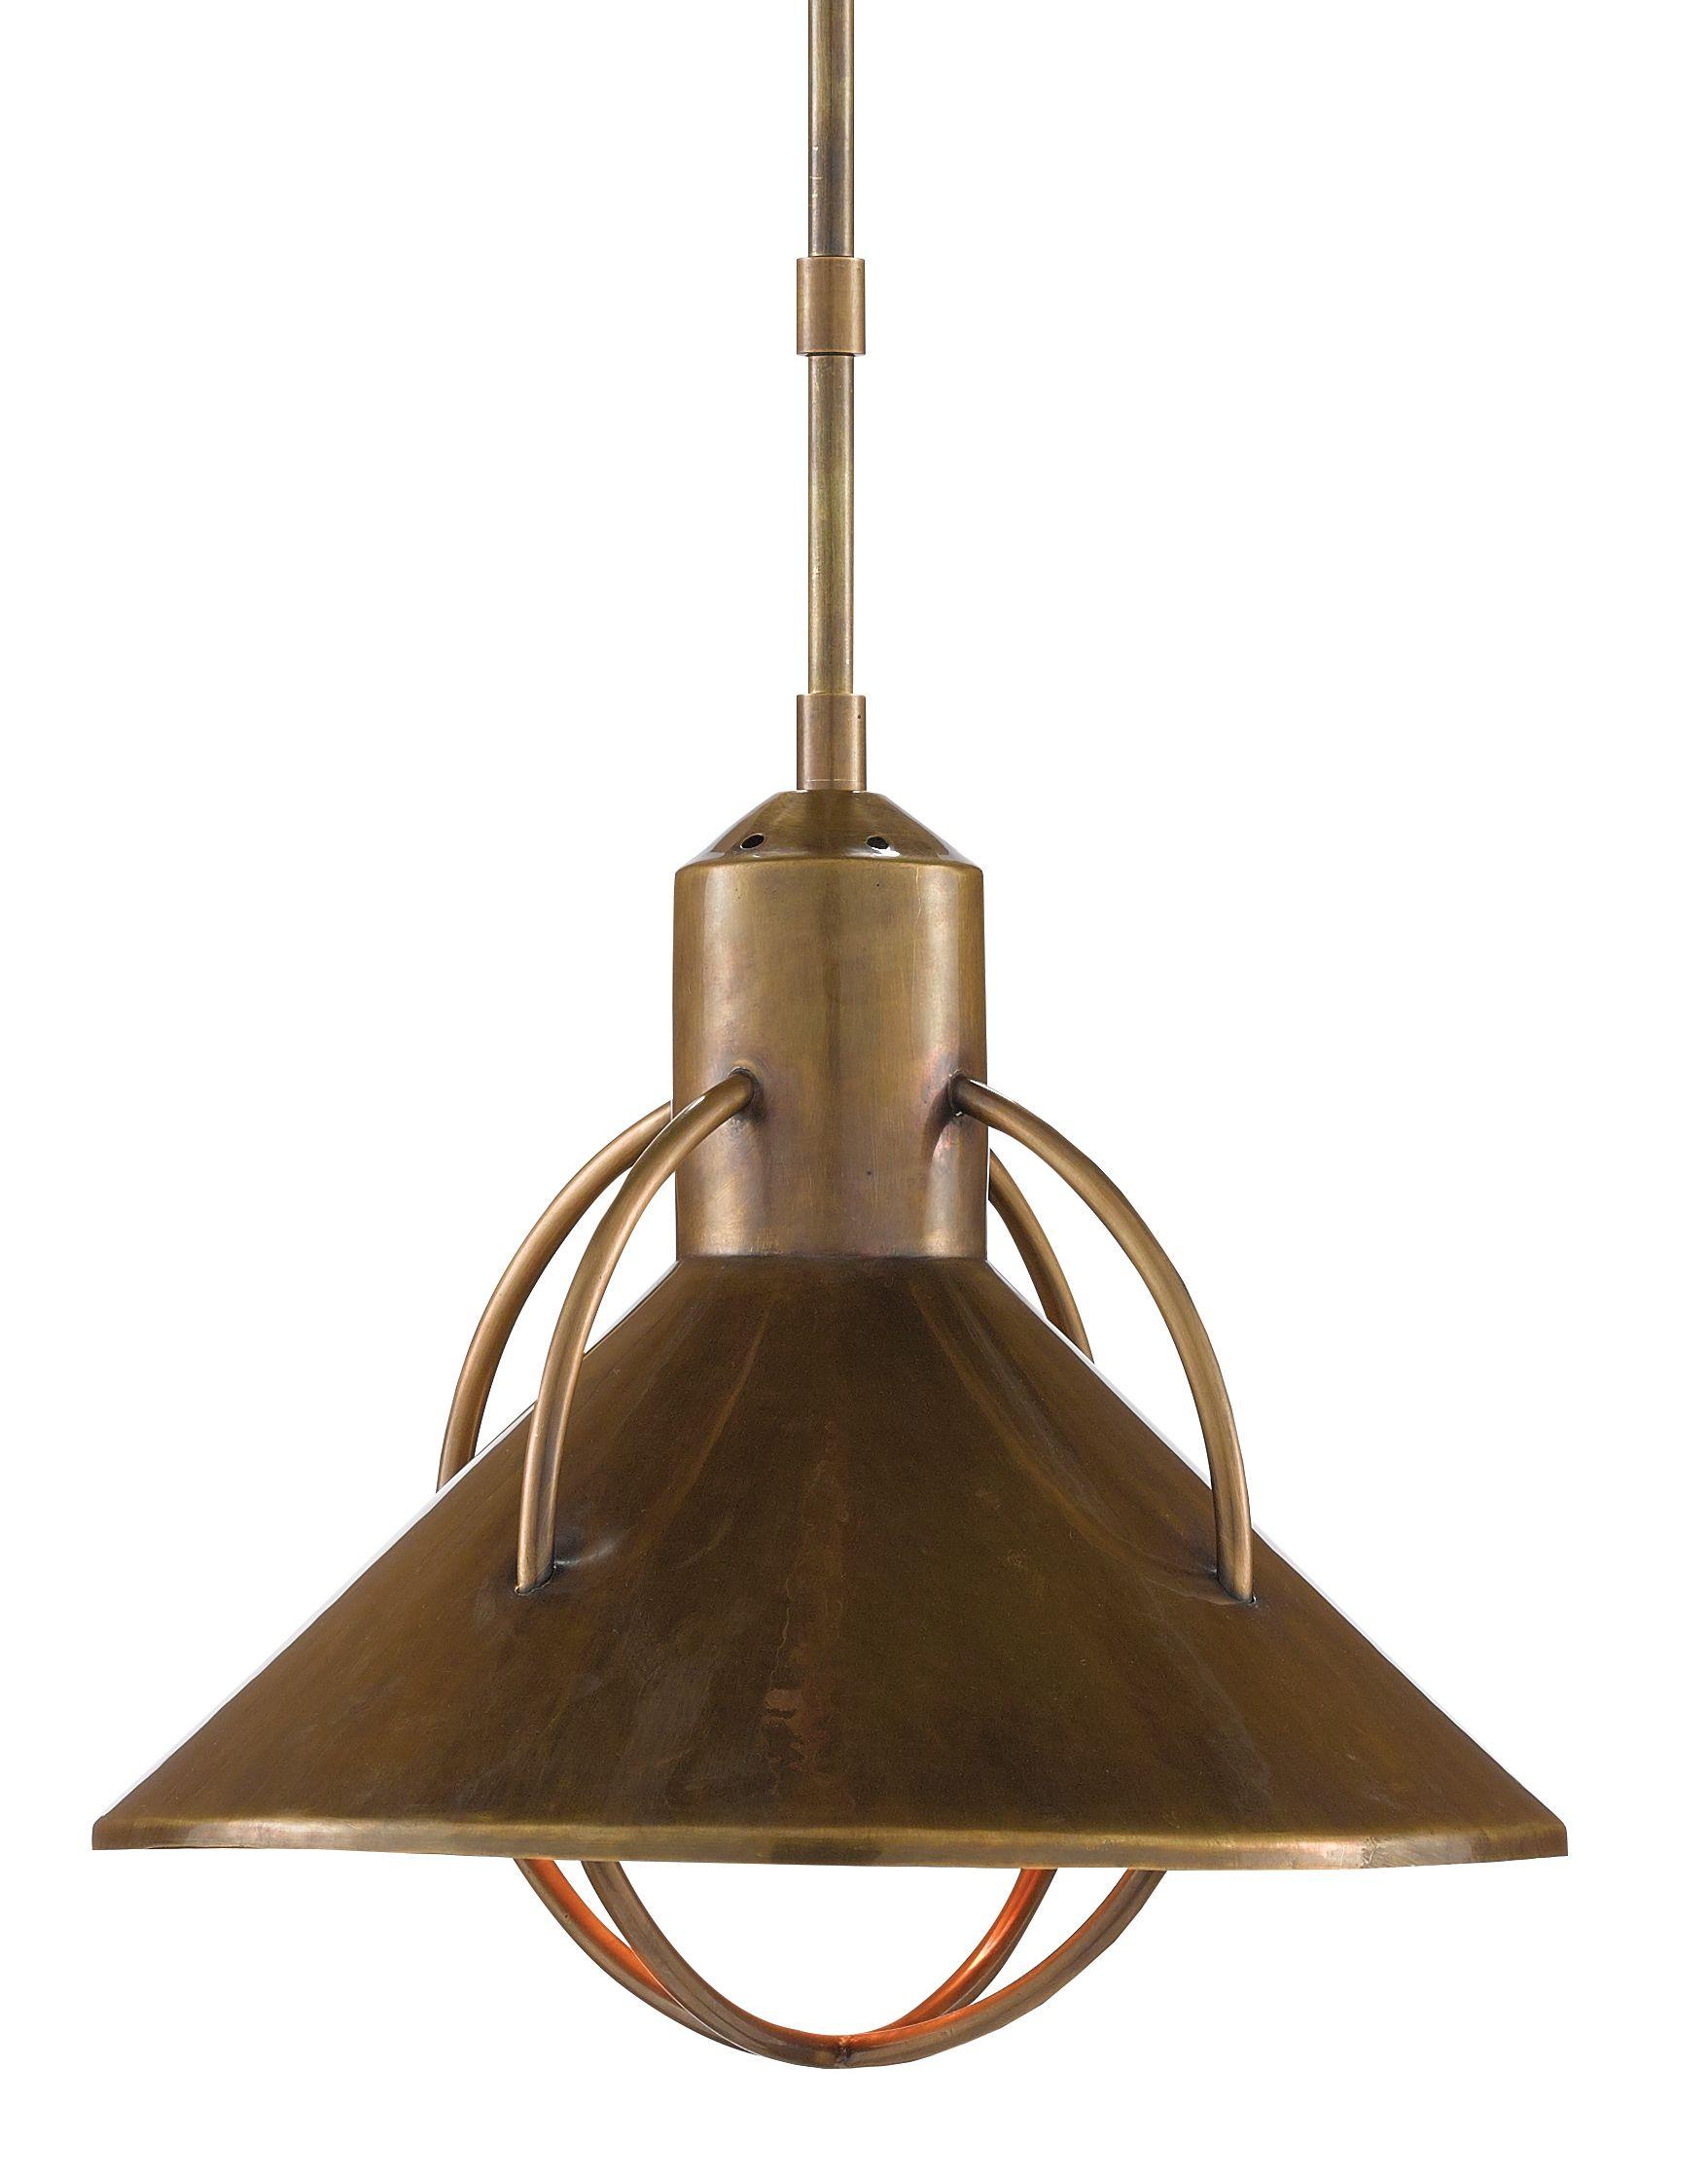 Aldington Pendant Currey And Company Vintage Chandelier Light Fixtures Vintage Brass Currey and company pendants